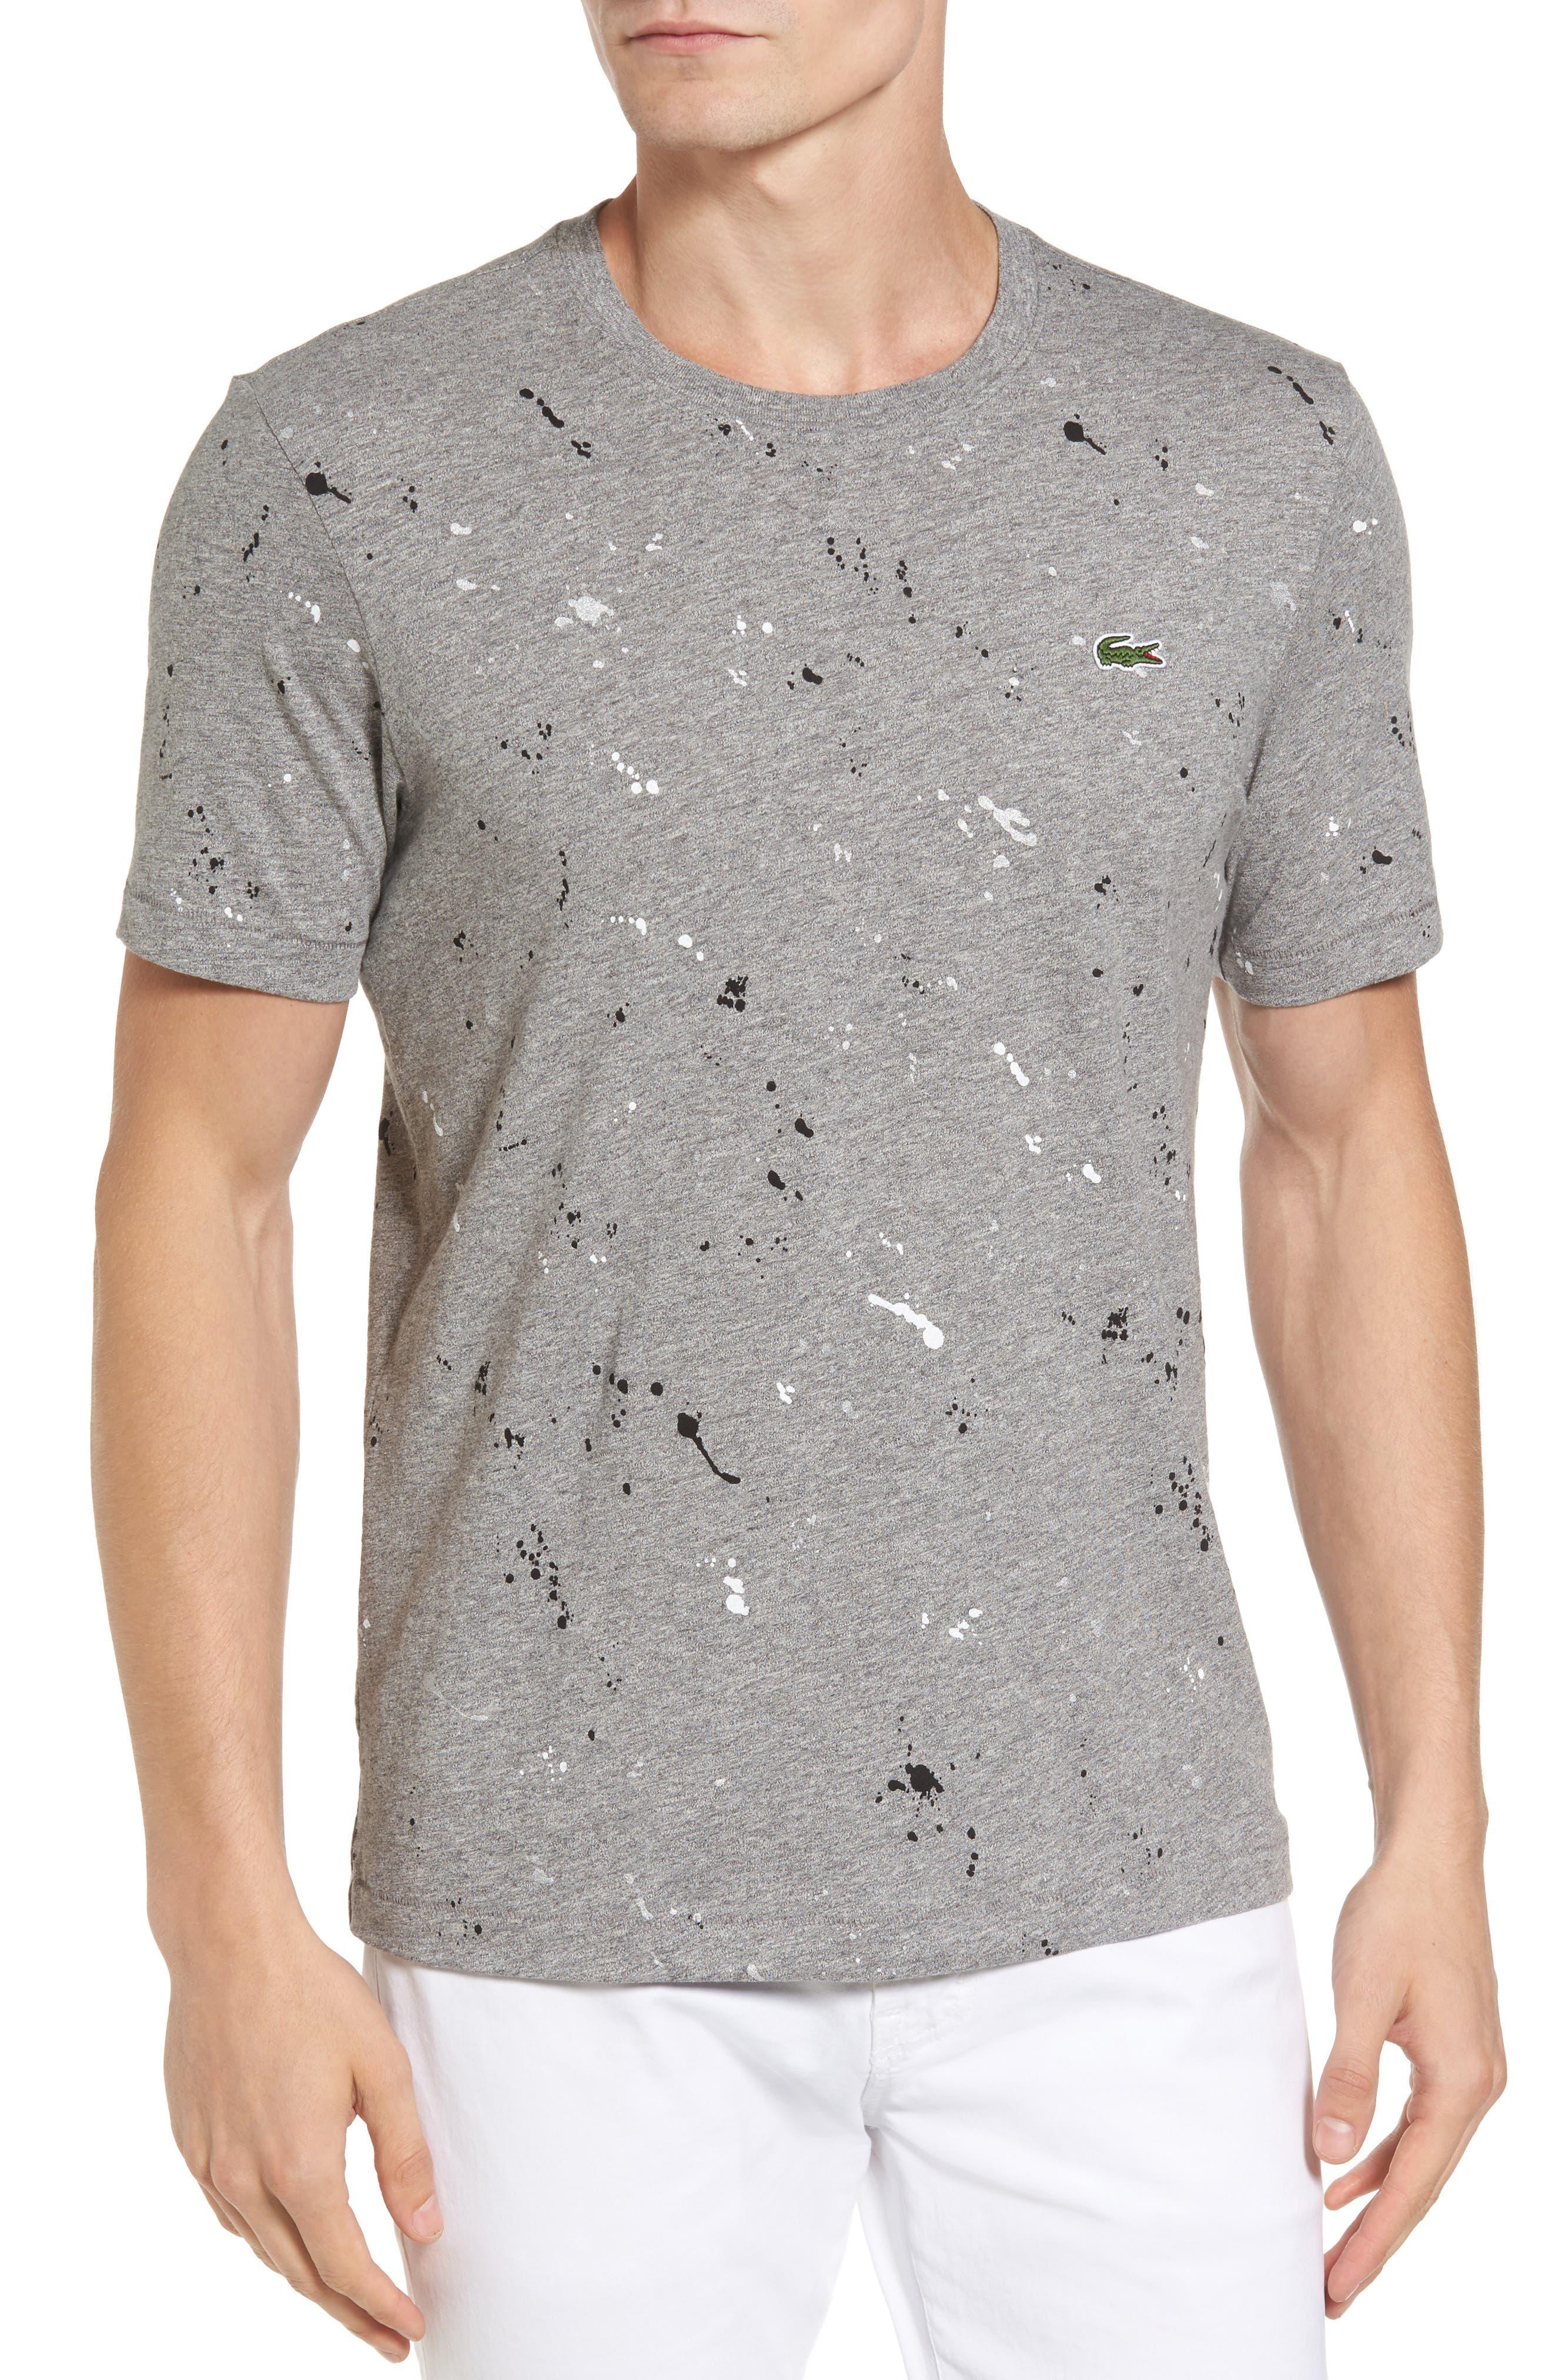 LACOSTE L!VE Splatter Print Graphic T-Shirt